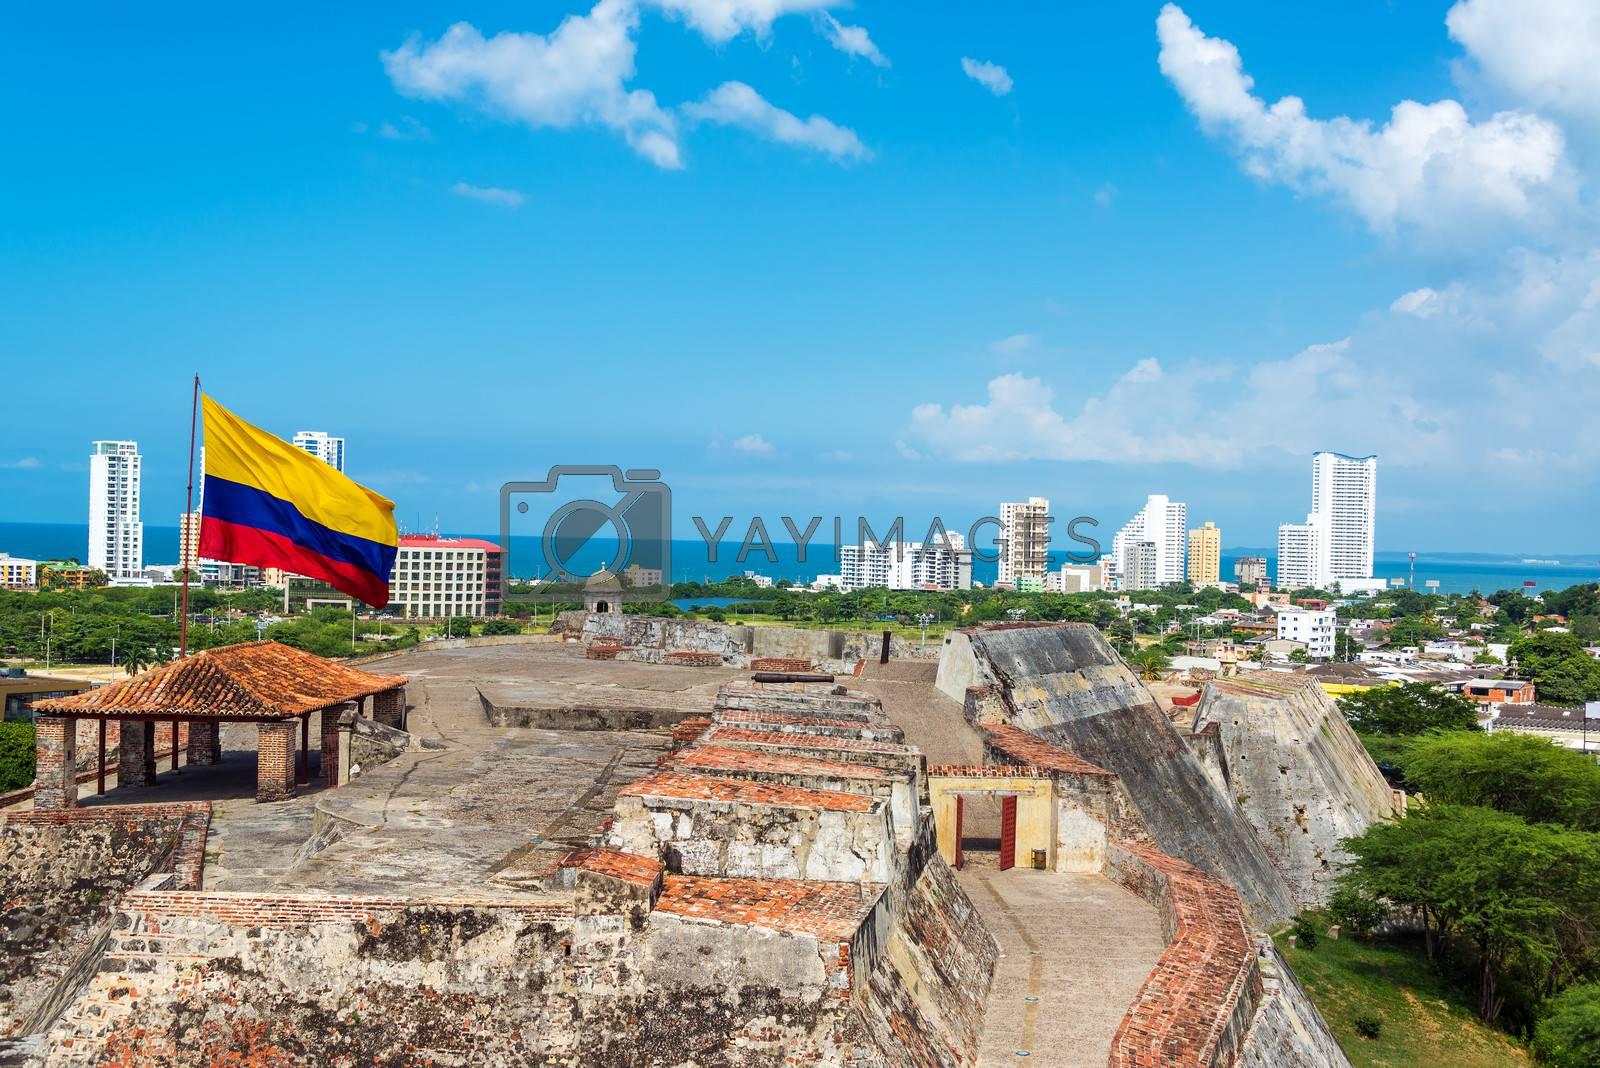 Royalty free image of San Felipe Castle and Skyline by jkraft5